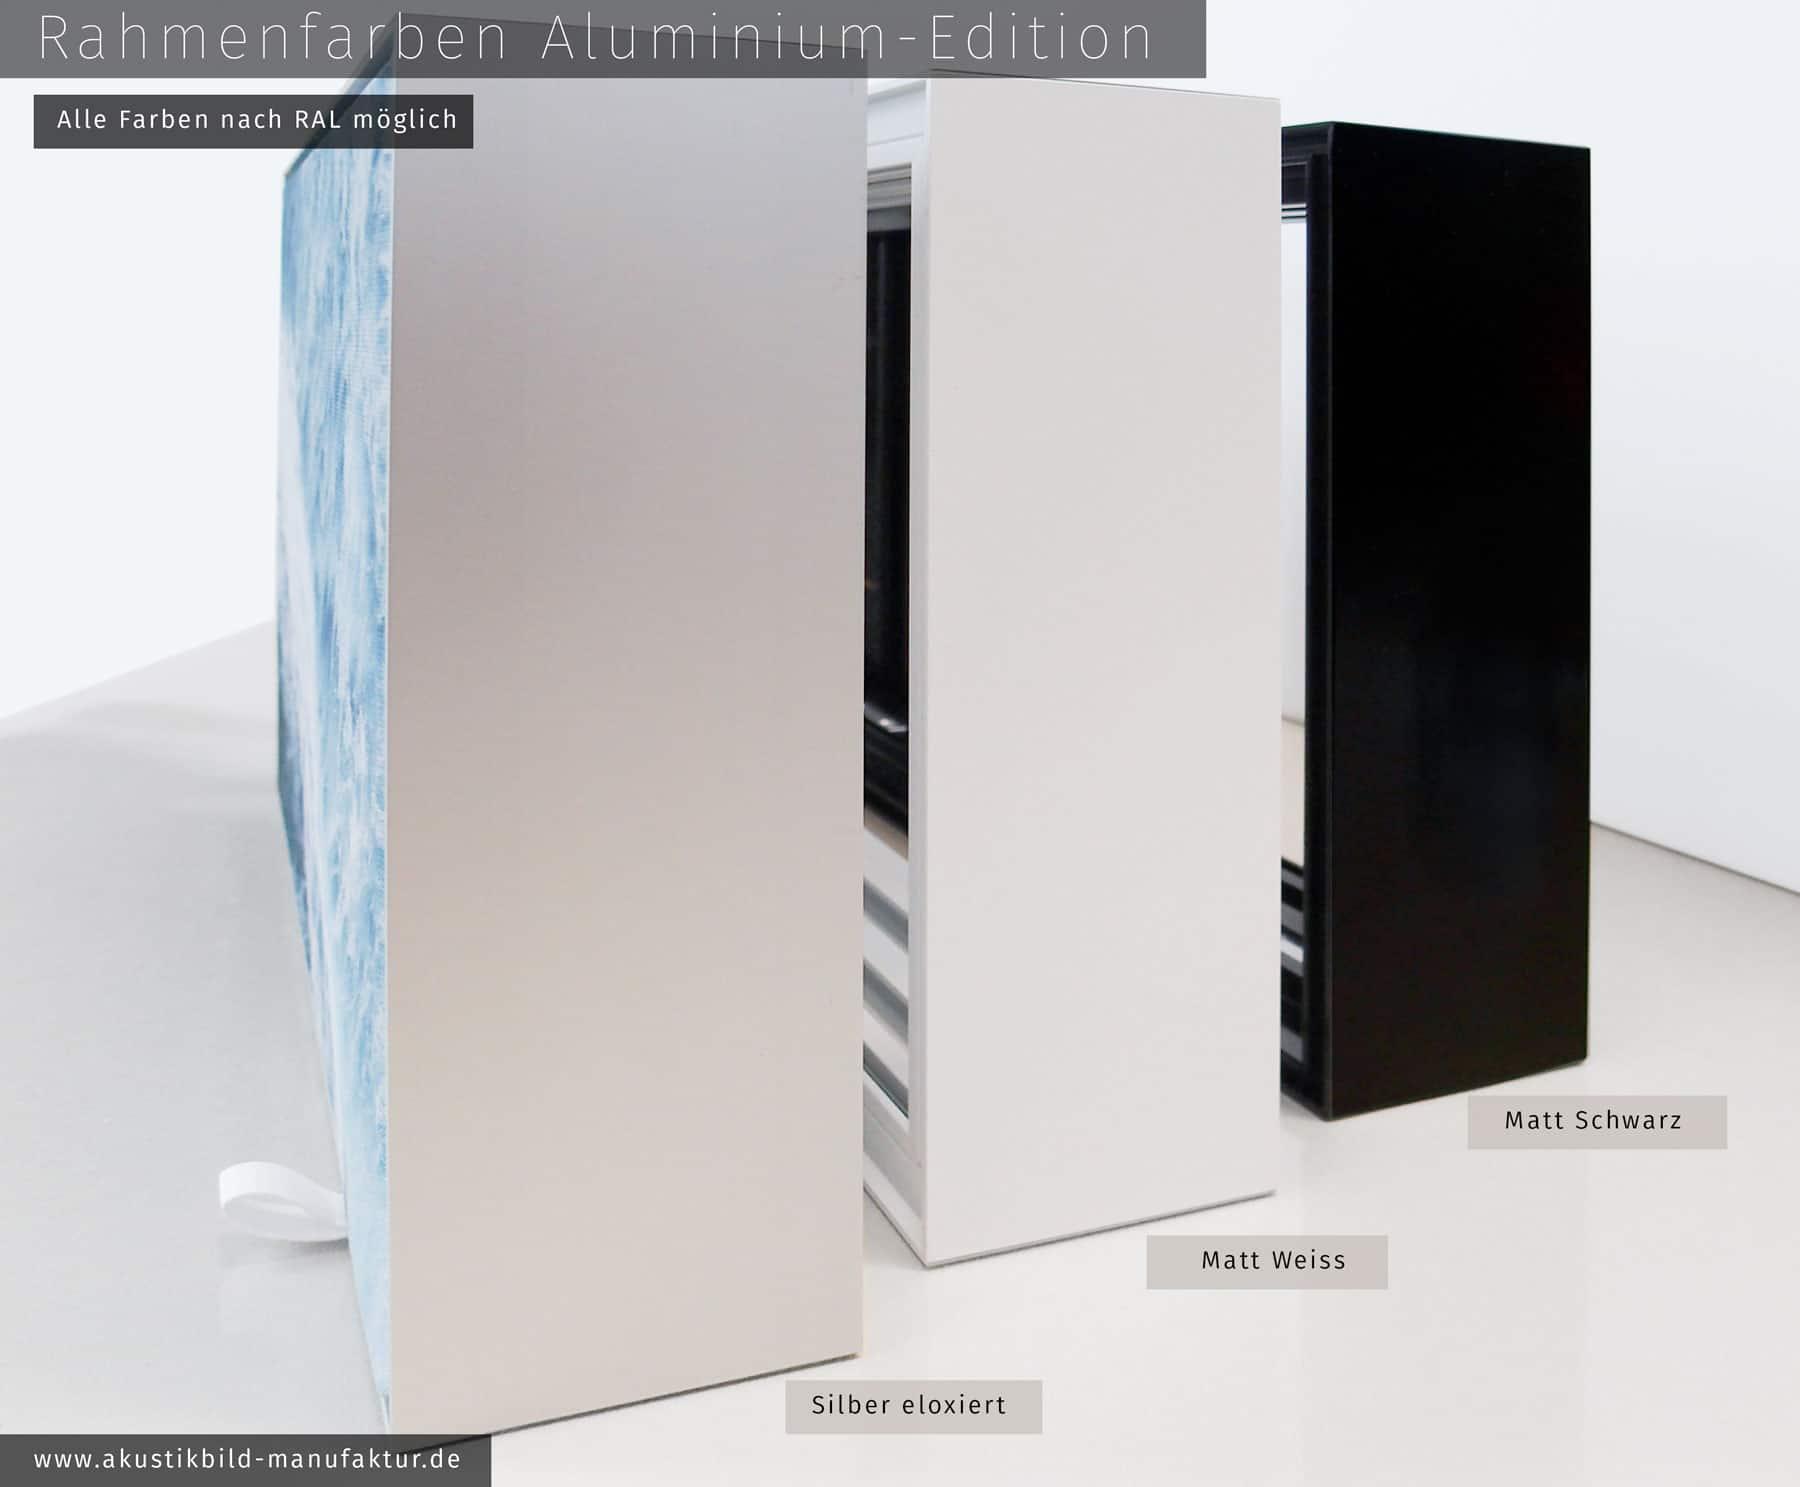 Raumakustik verbessern mit Absorberbildern in Aluminium-Rahmen farbig lackiert